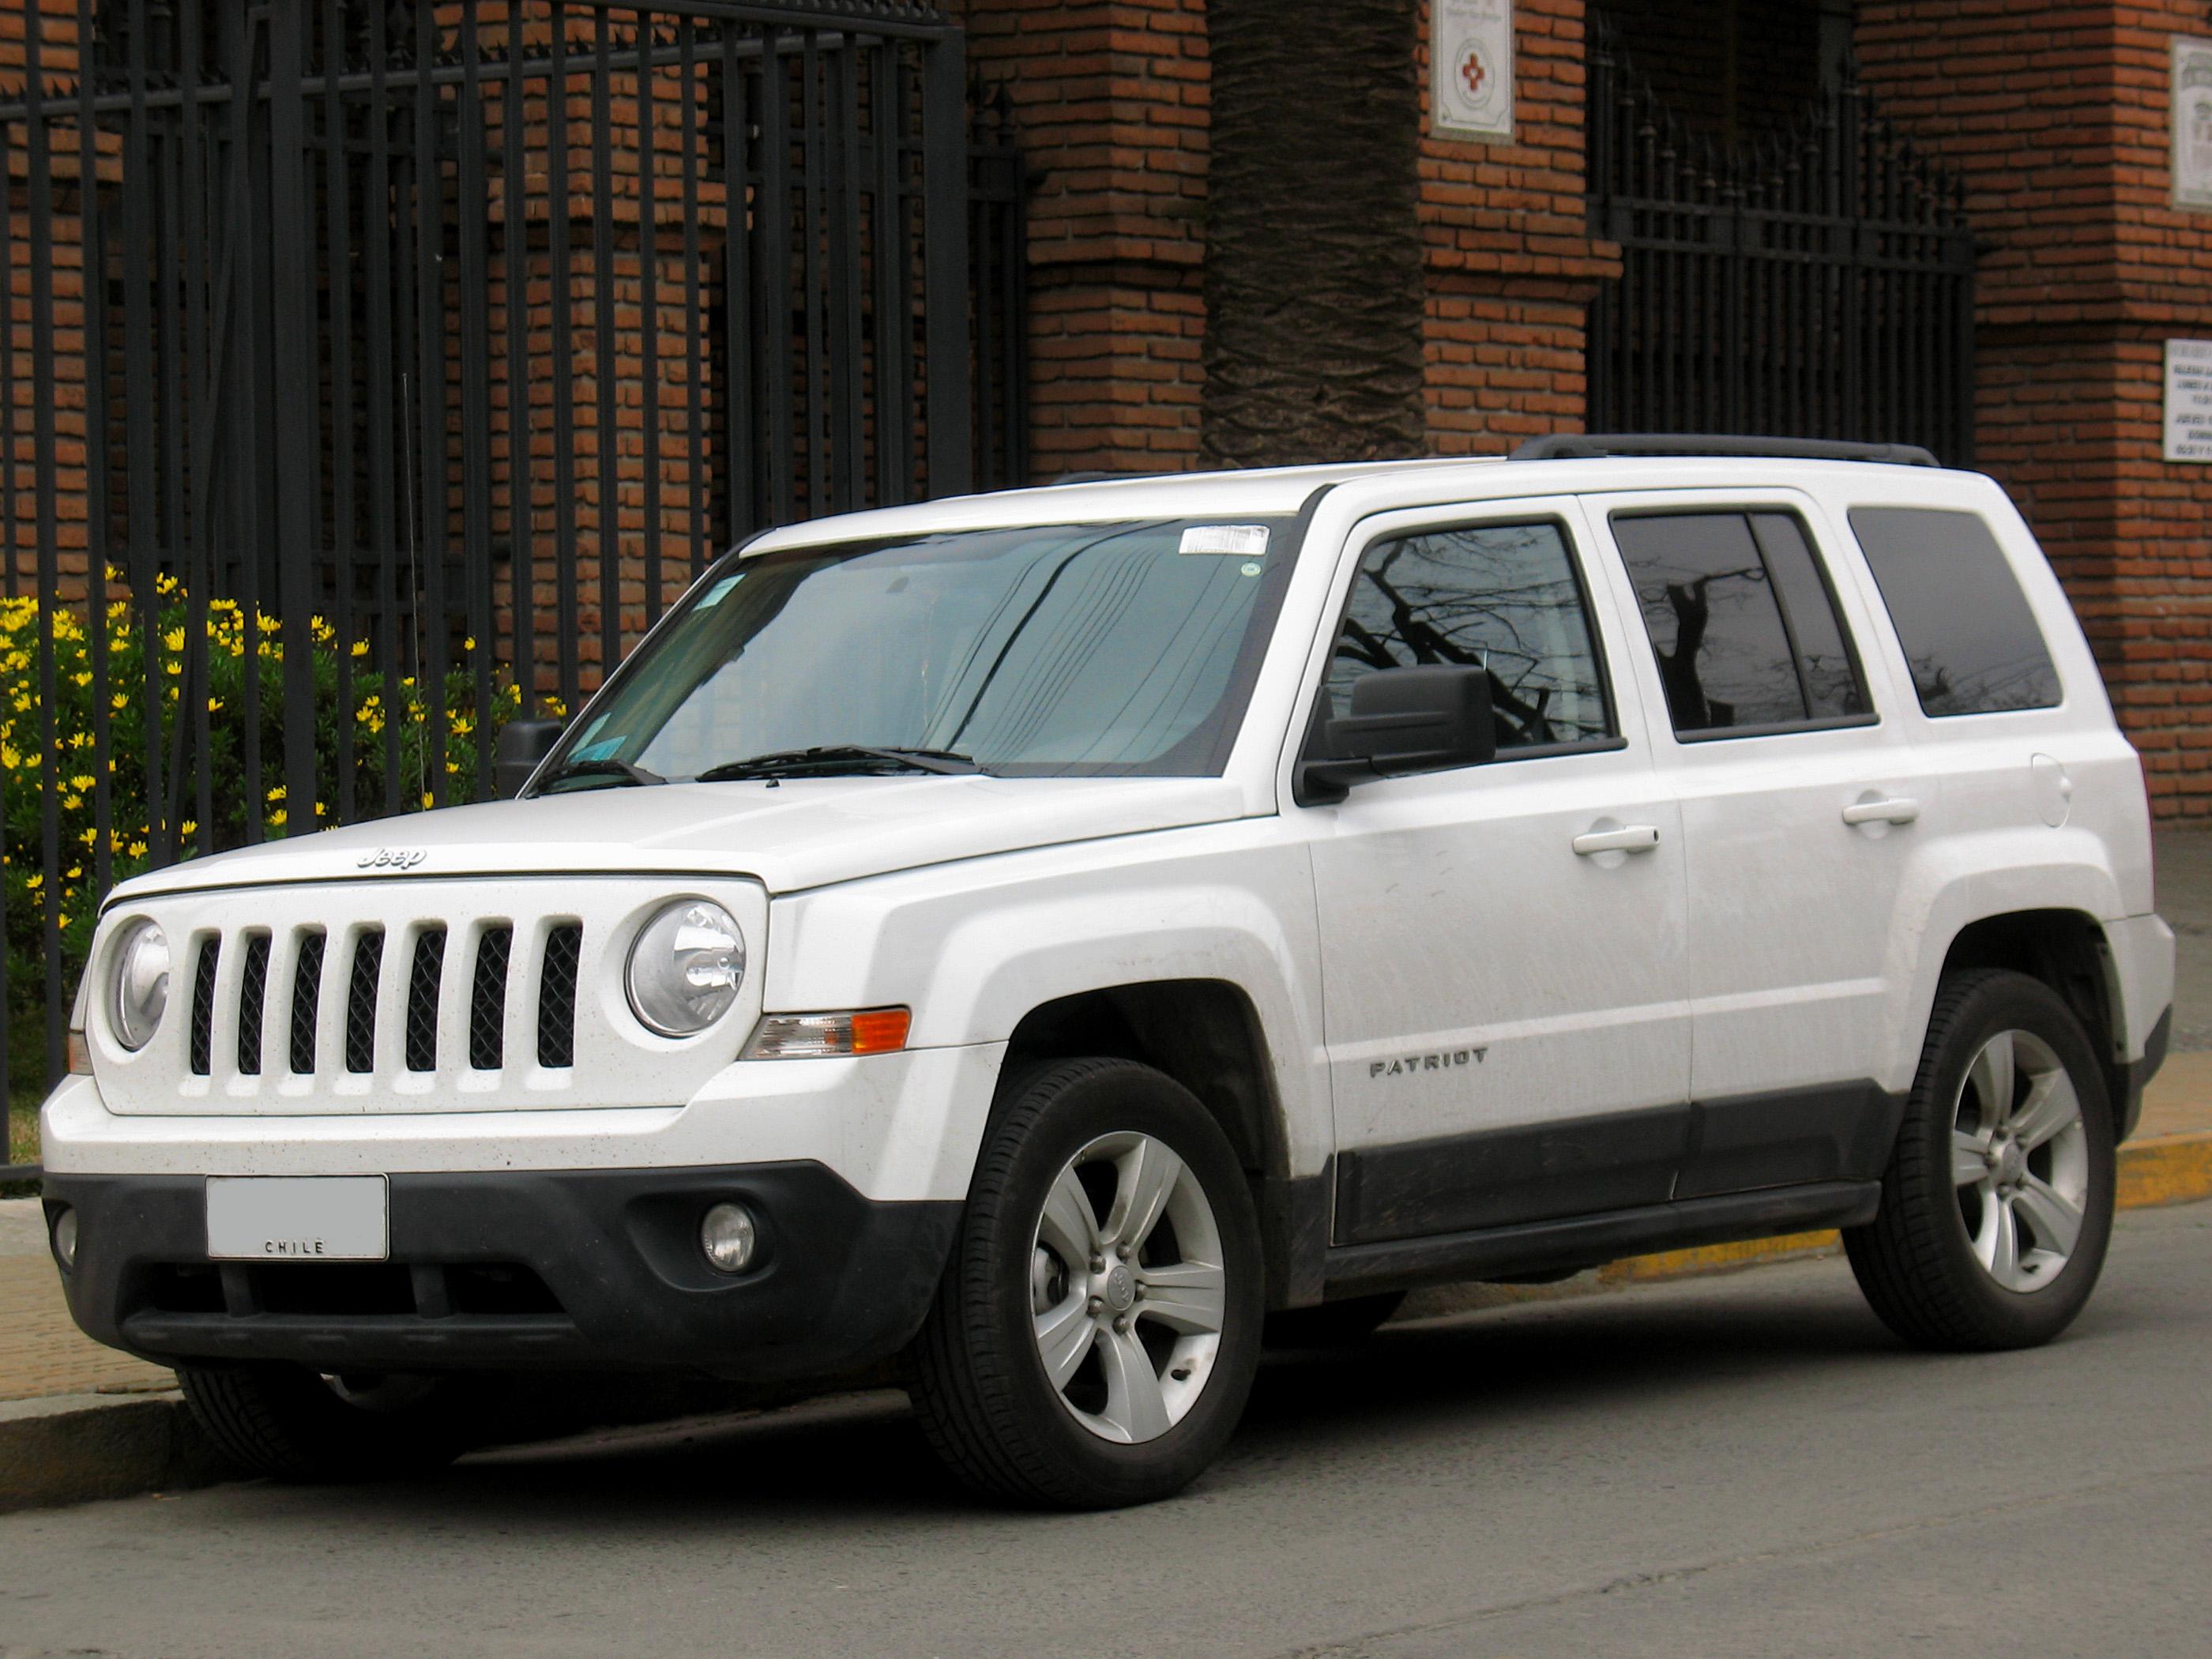 File:Jeep Patriot 2.4 Sport 2014 (15246134917)